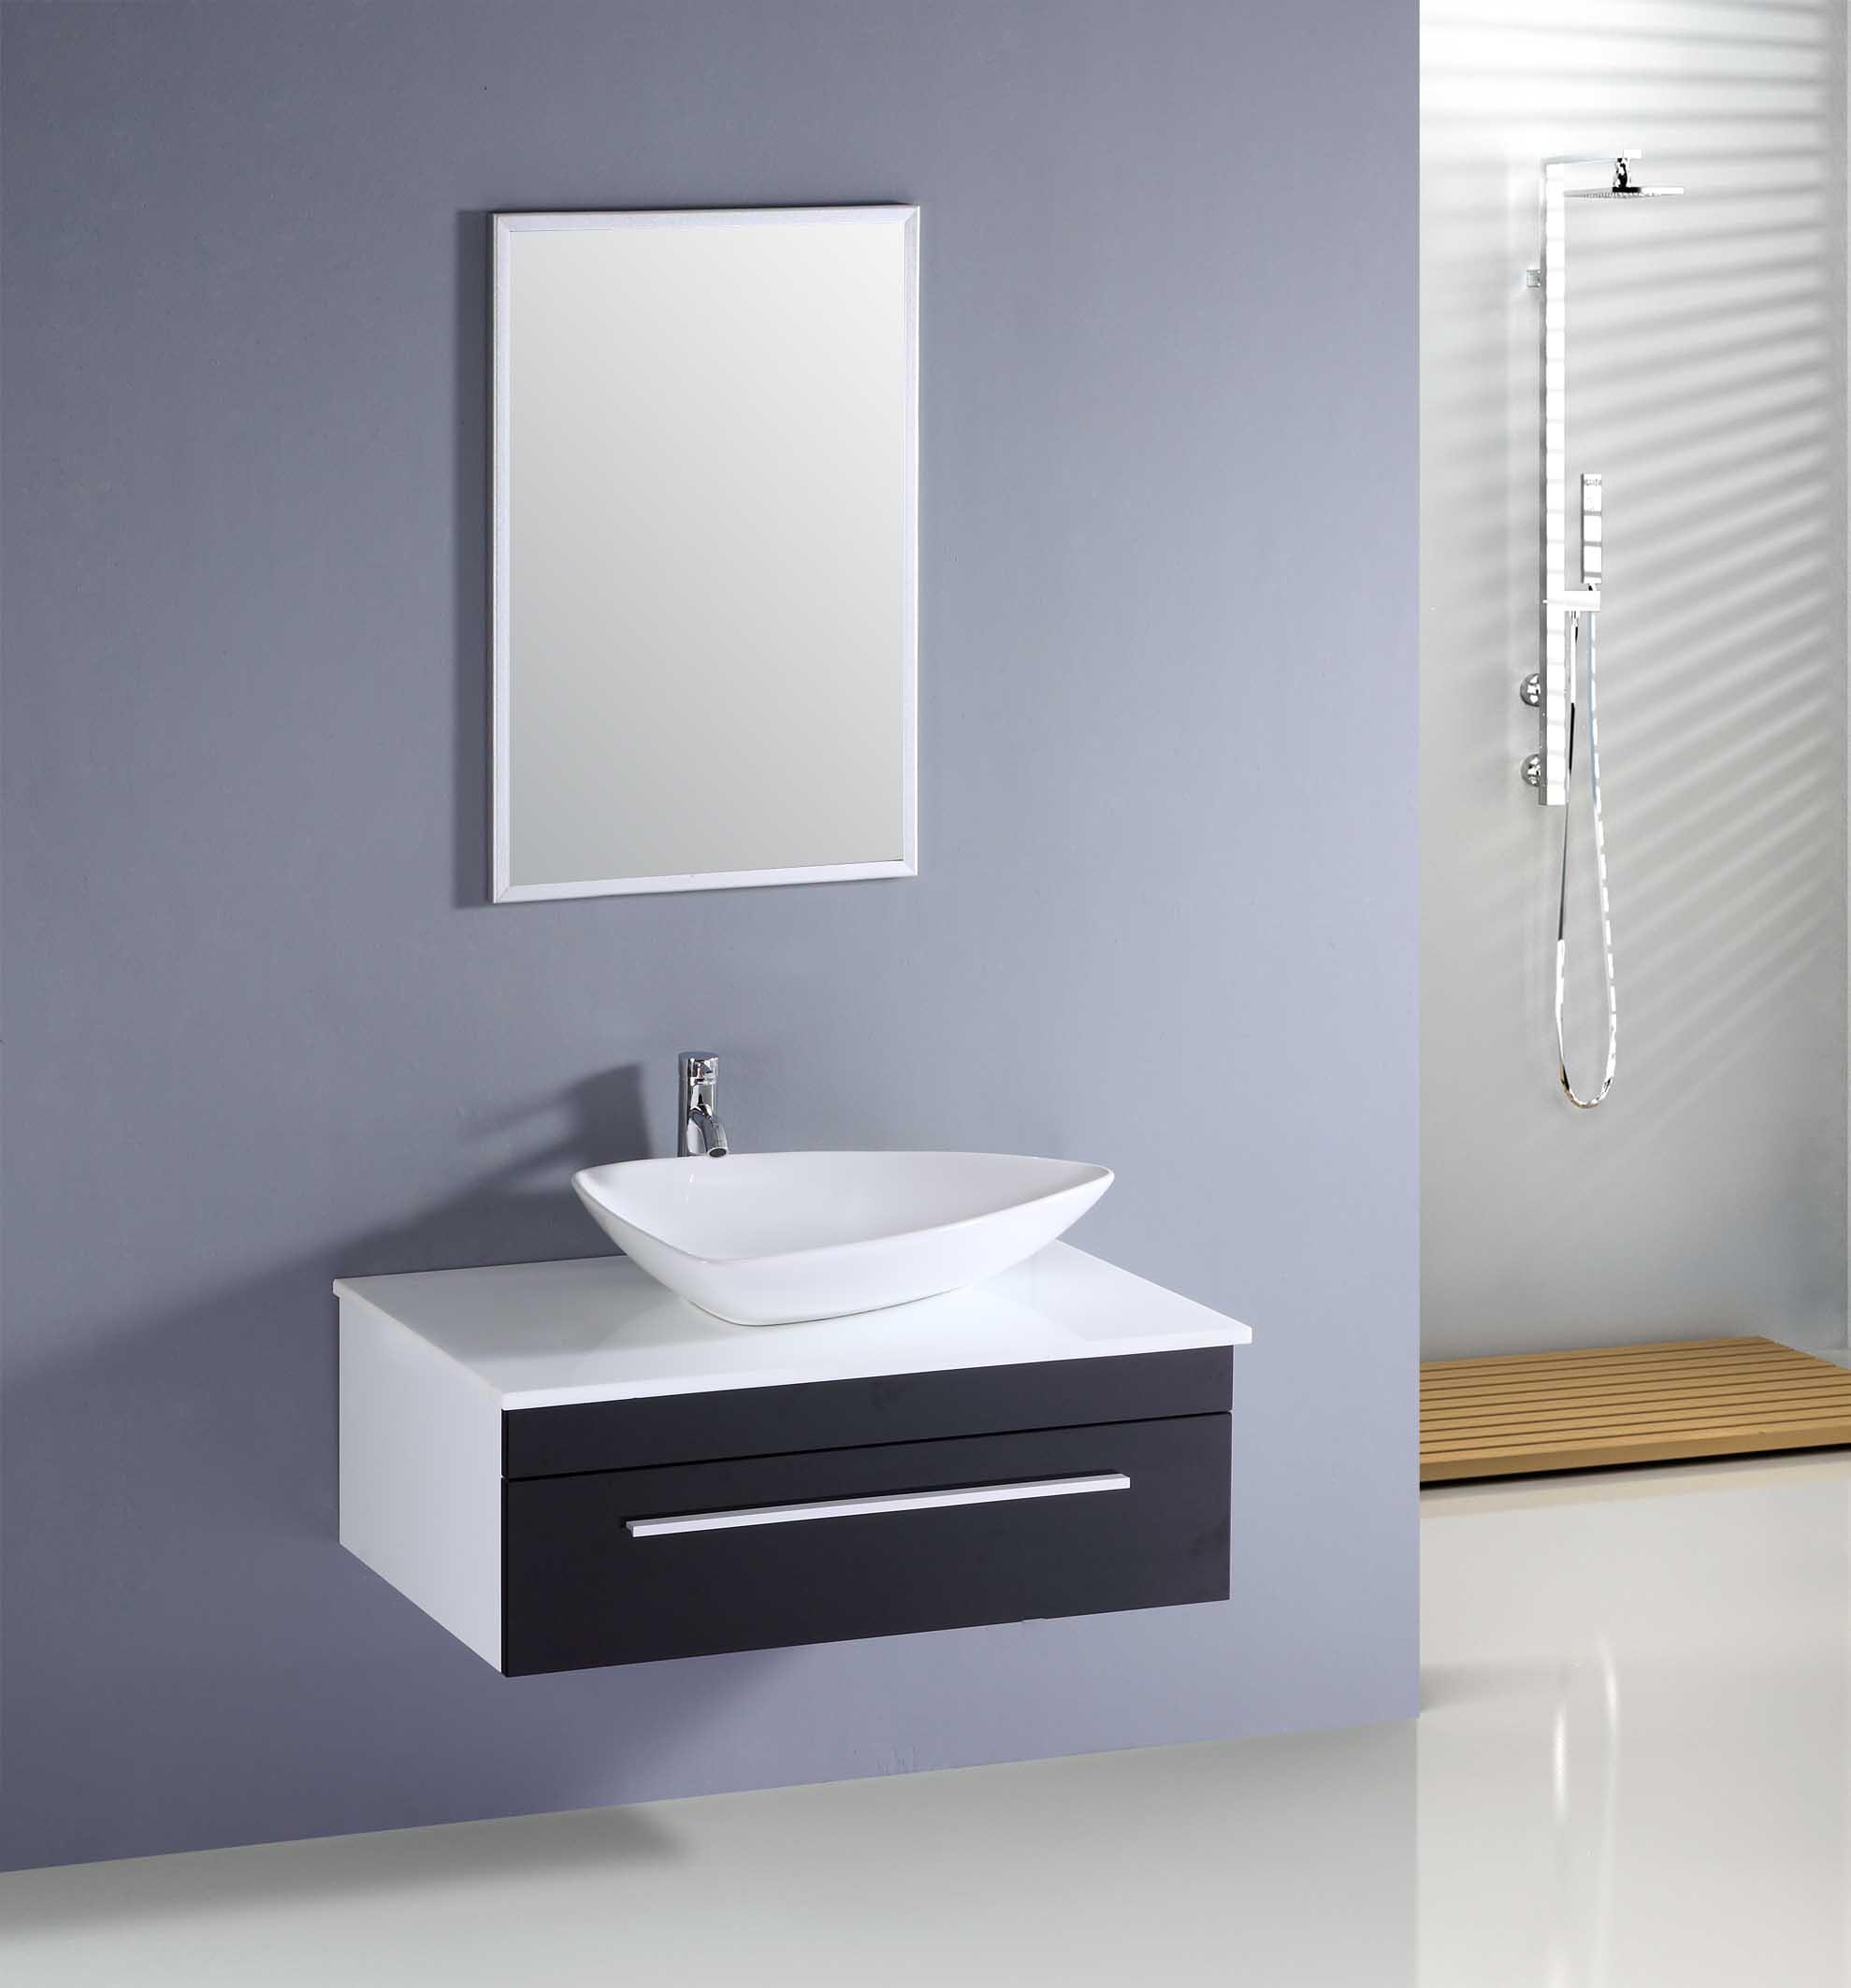 bathroom-glossy-delightful-bathroom-decoration-cabinet-with-mirror